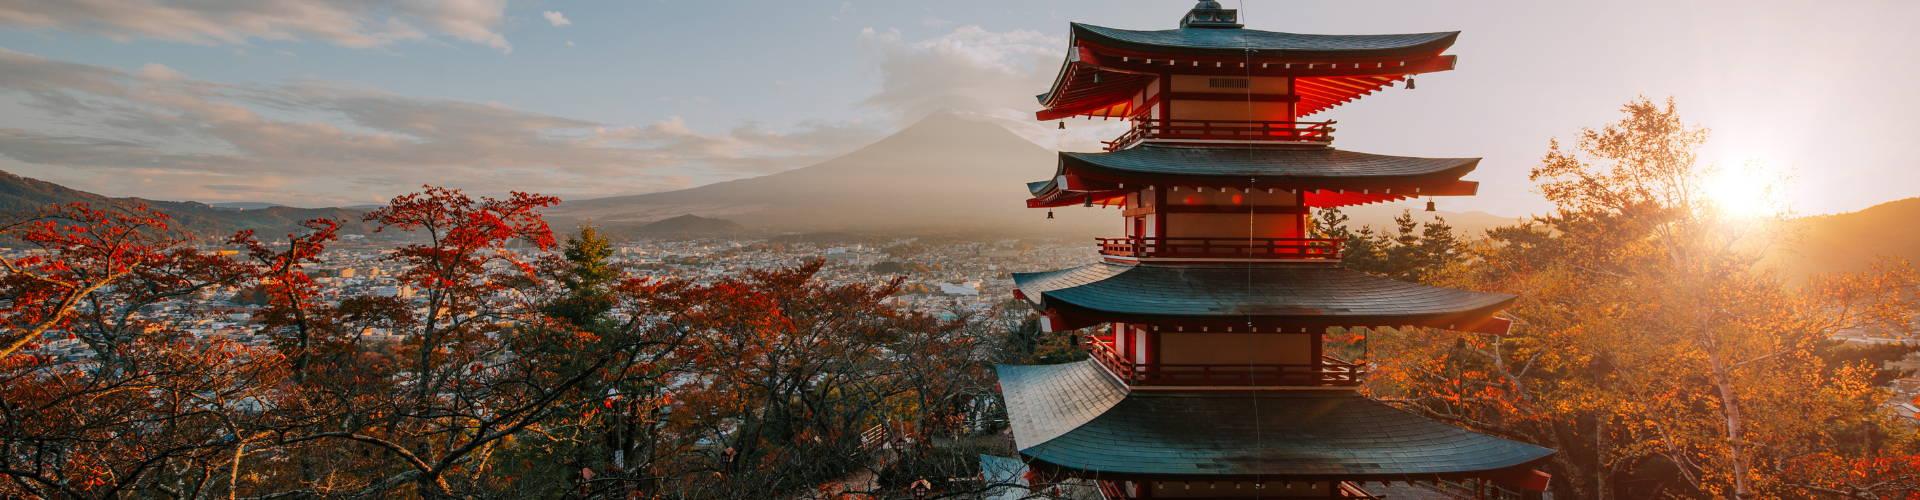 Japan incense culture